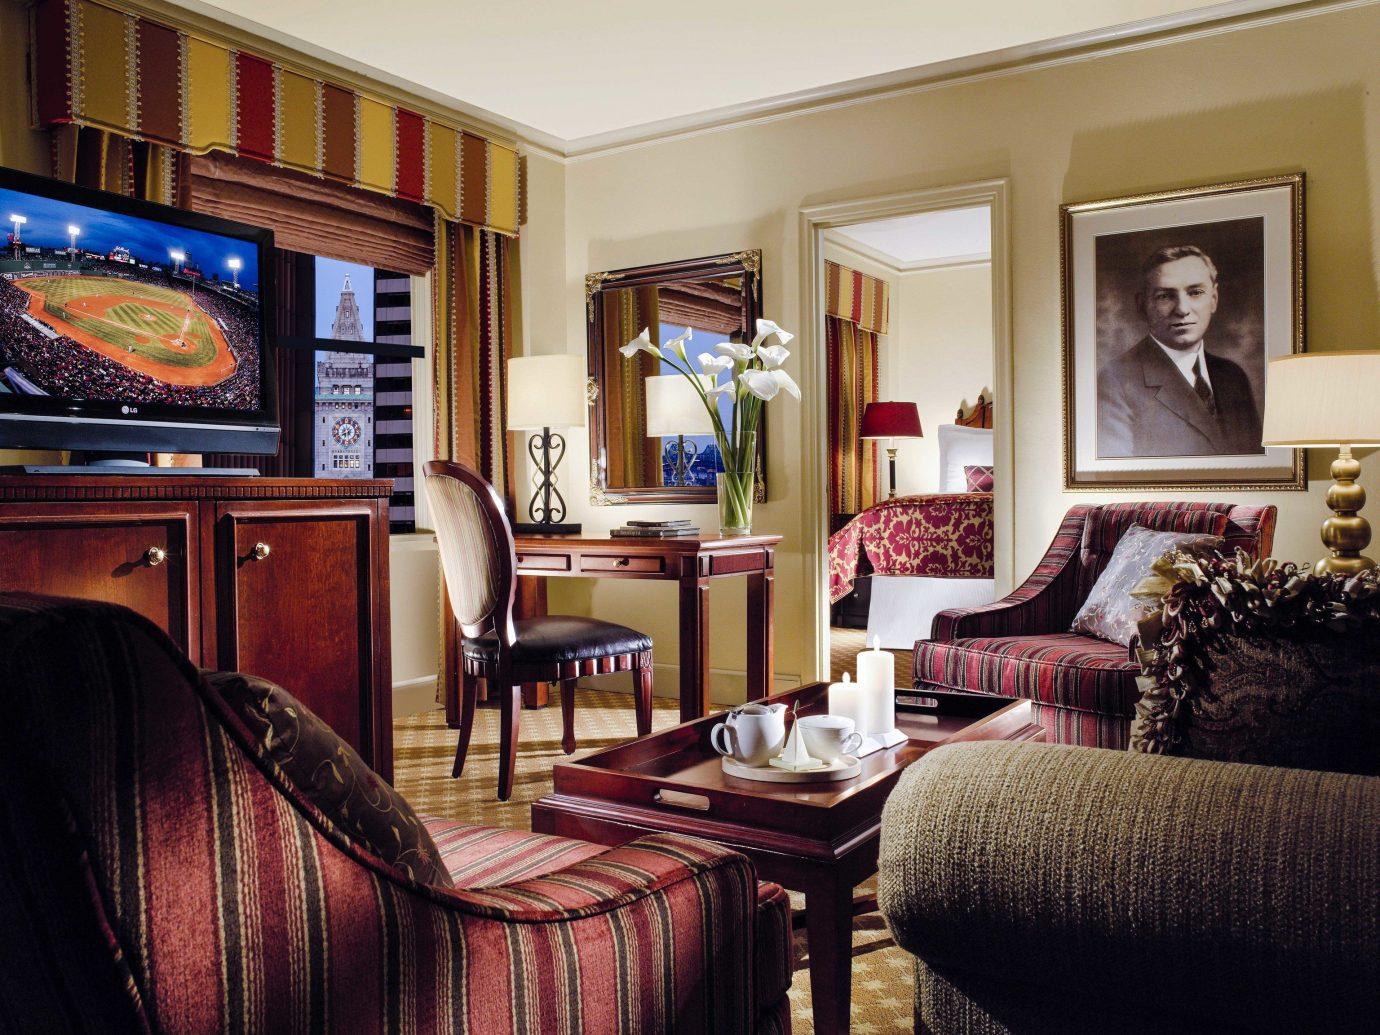 Hotels indoor wall room living room Living interior design Suite home real estate window furniture